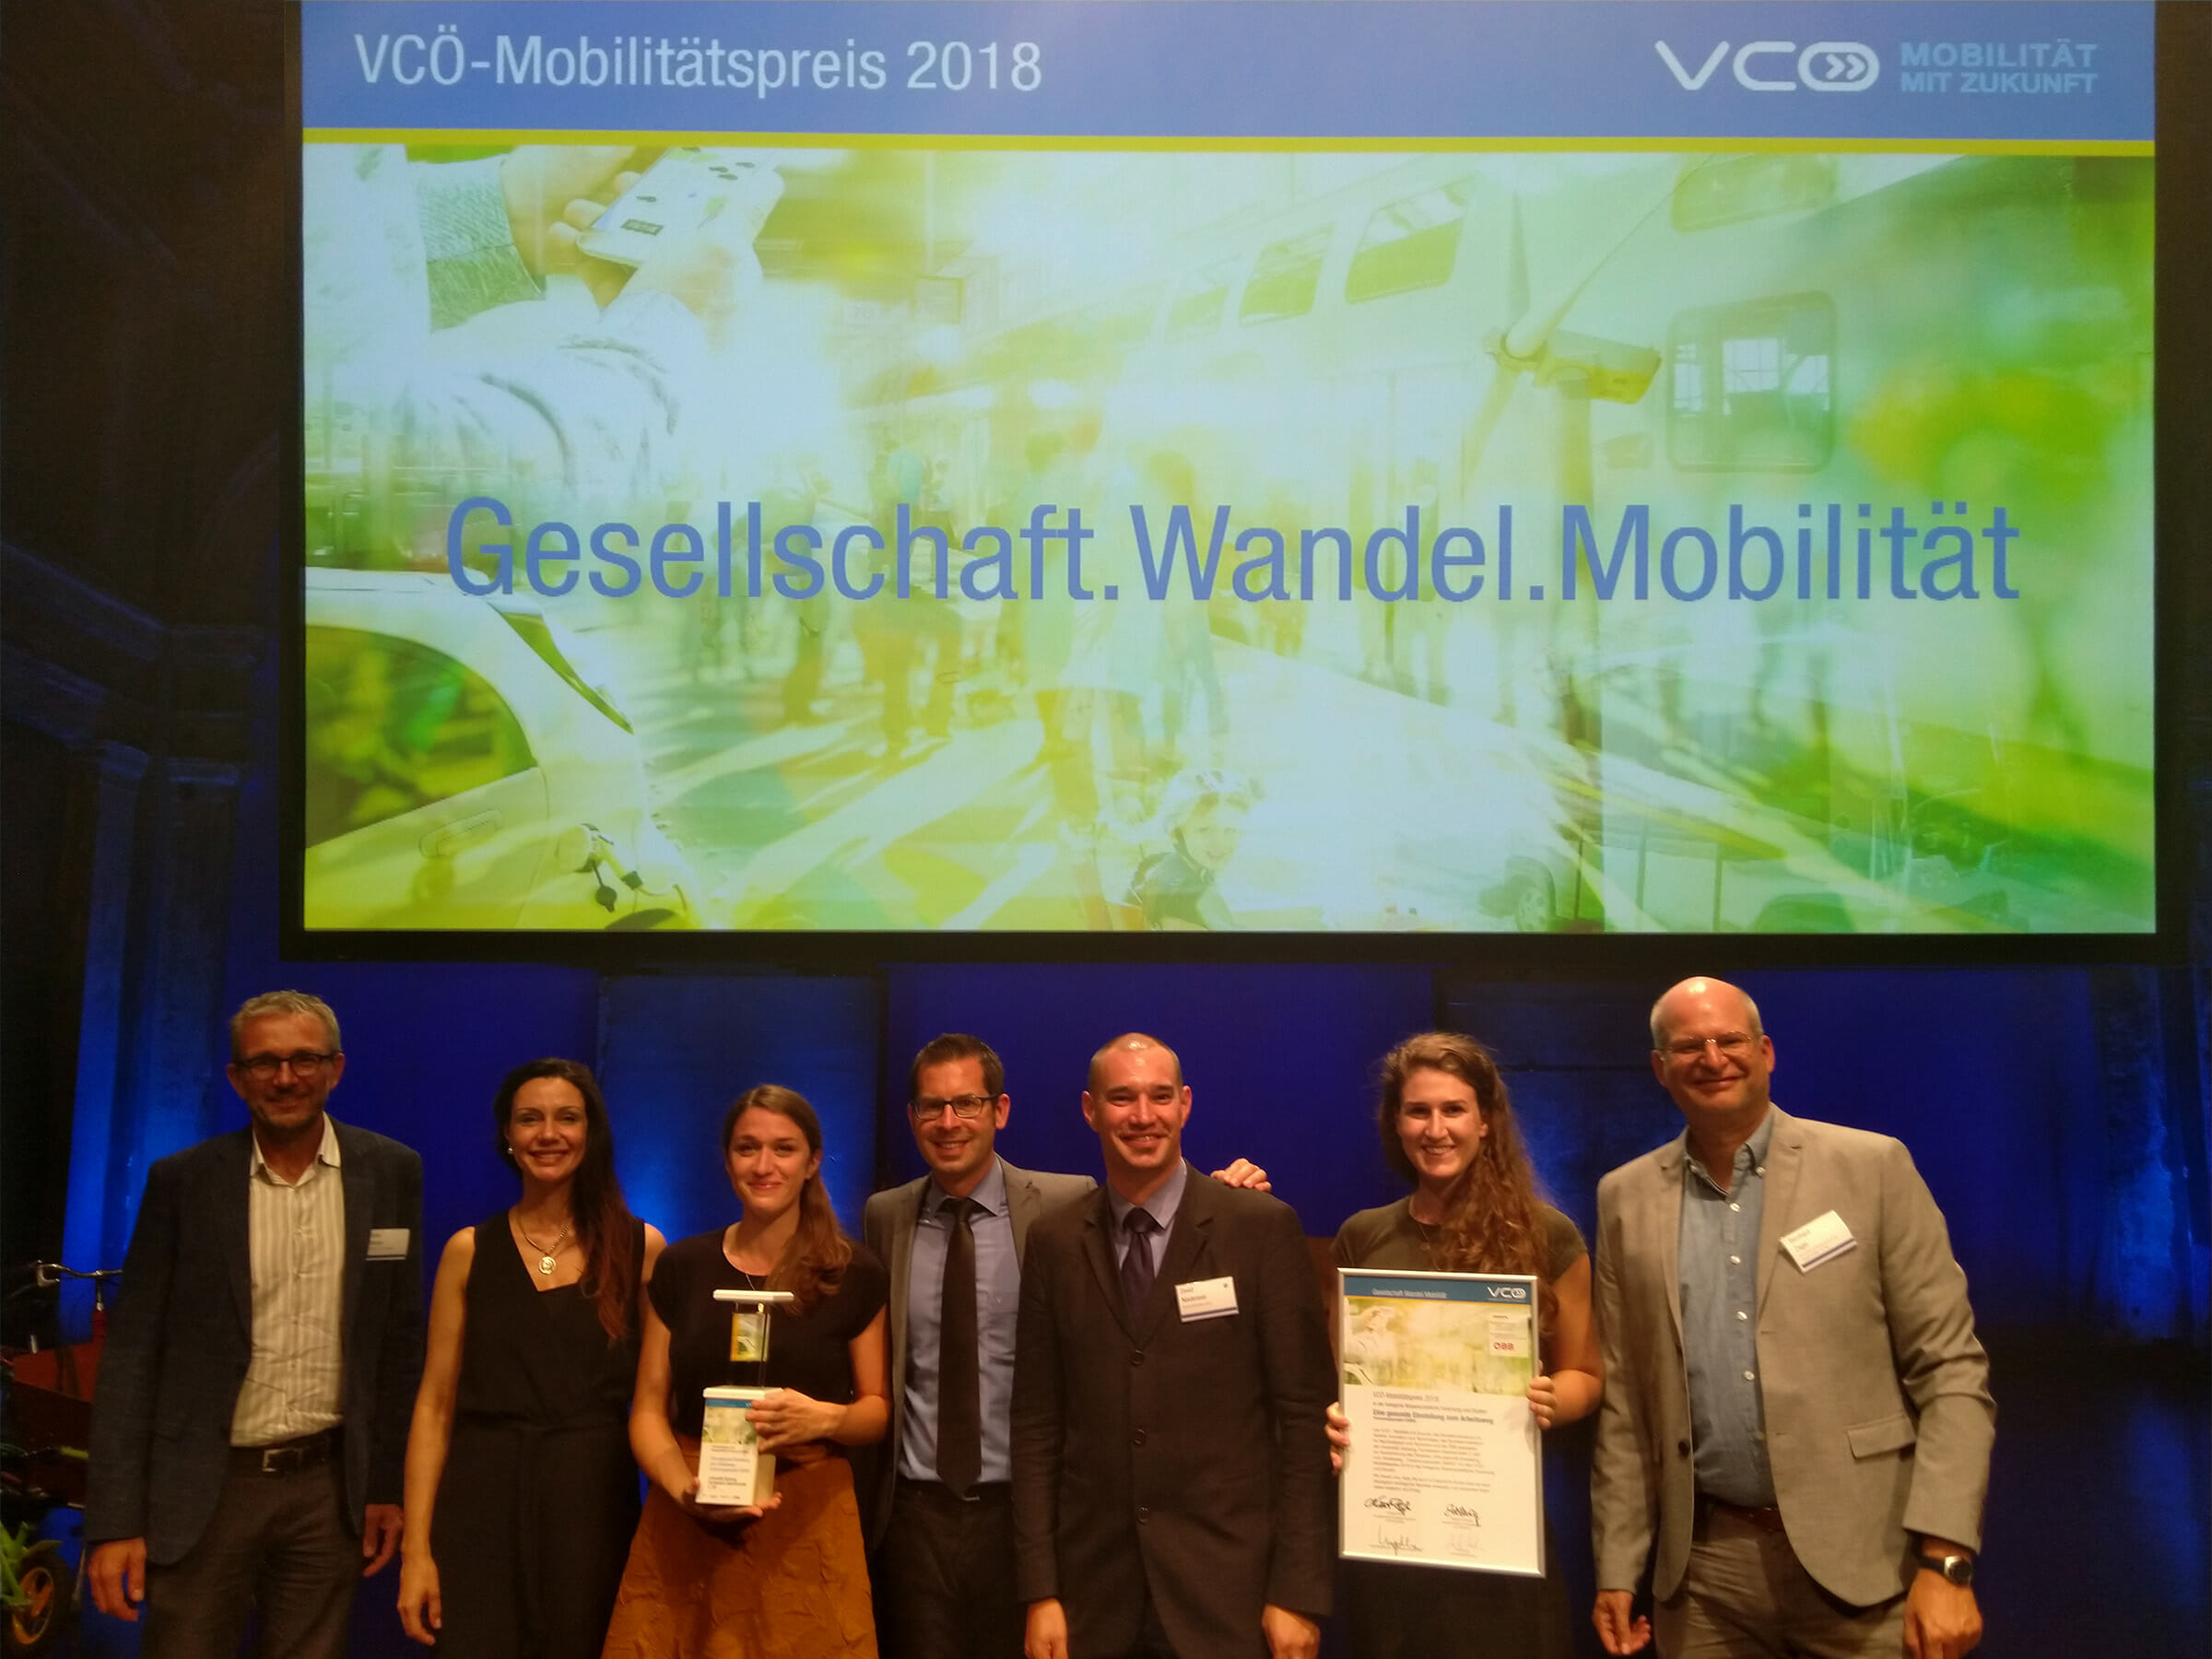 Preisverleihung des VCOÖ 2018, Gismo Konsortium